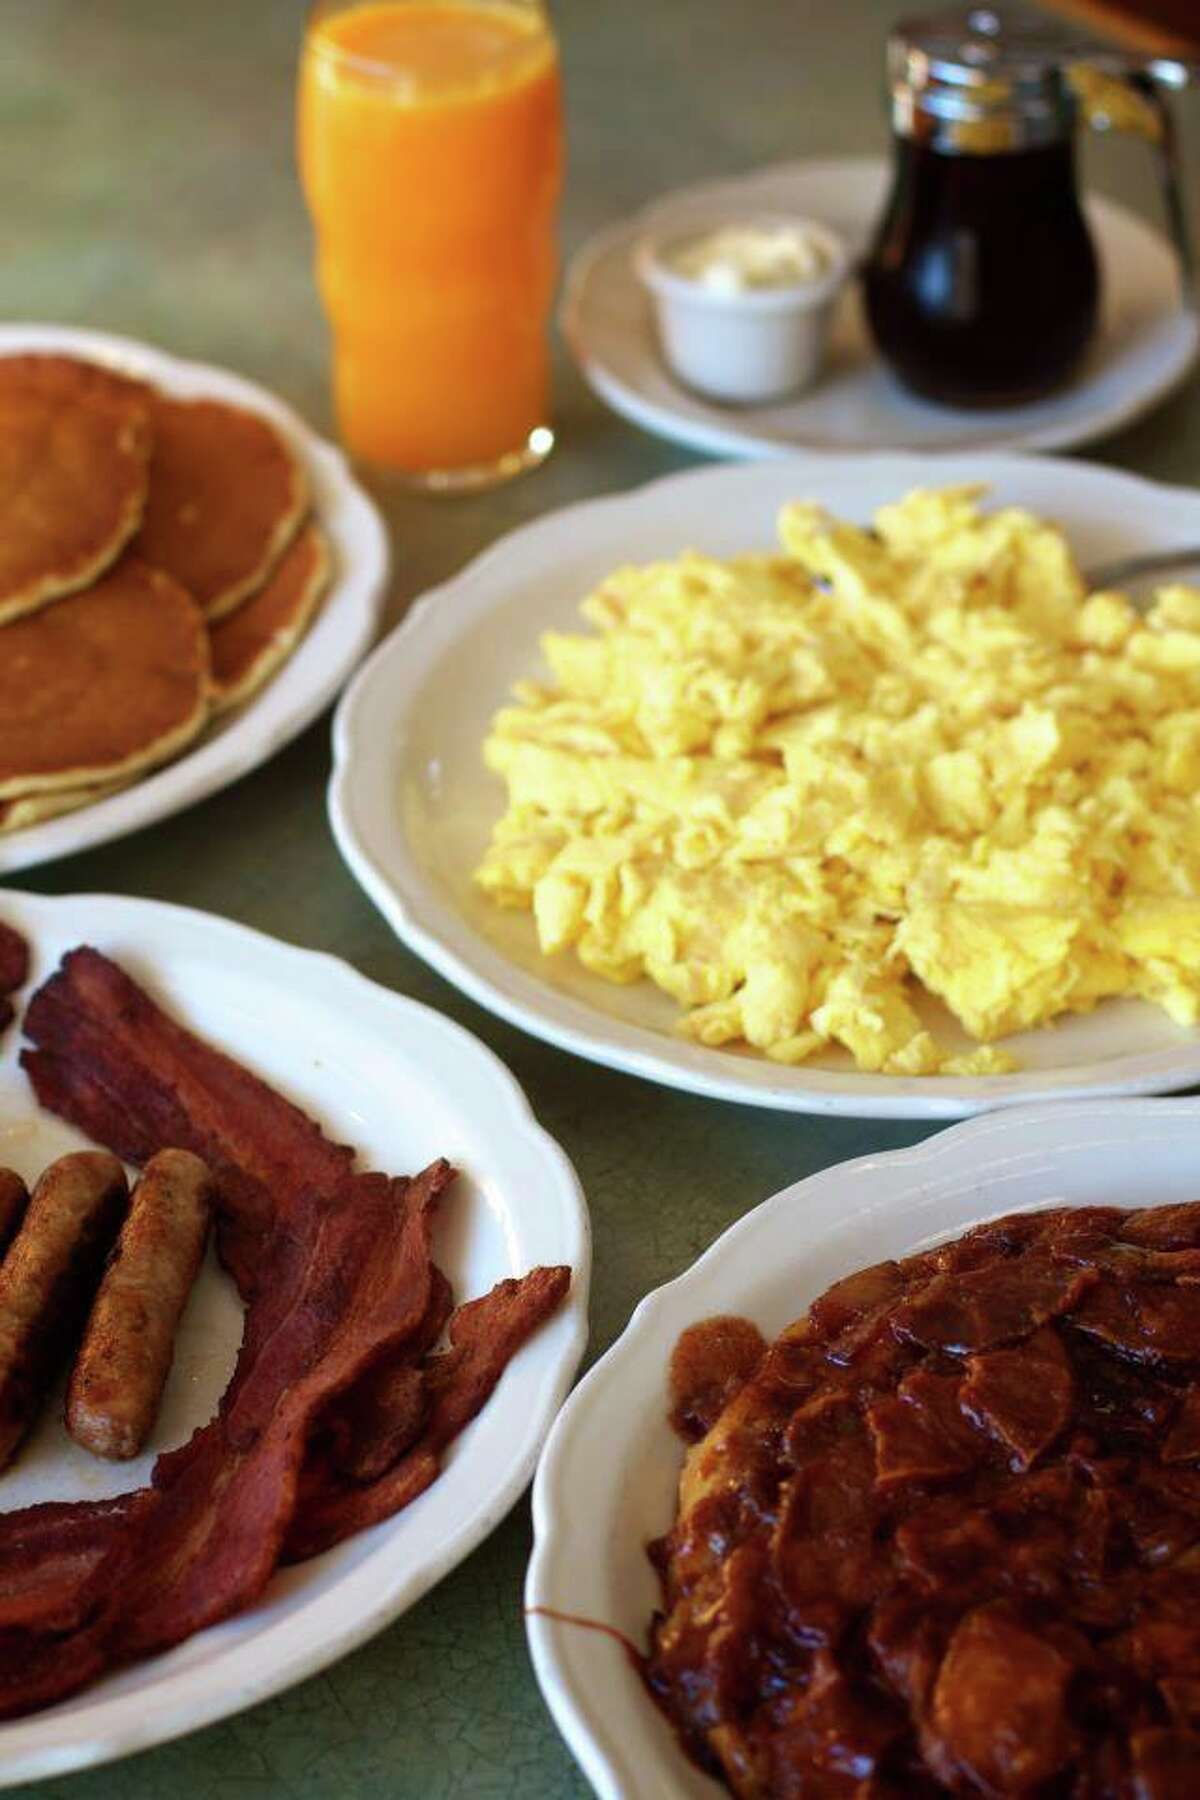 Breakfast spread at The Original Pancake House.